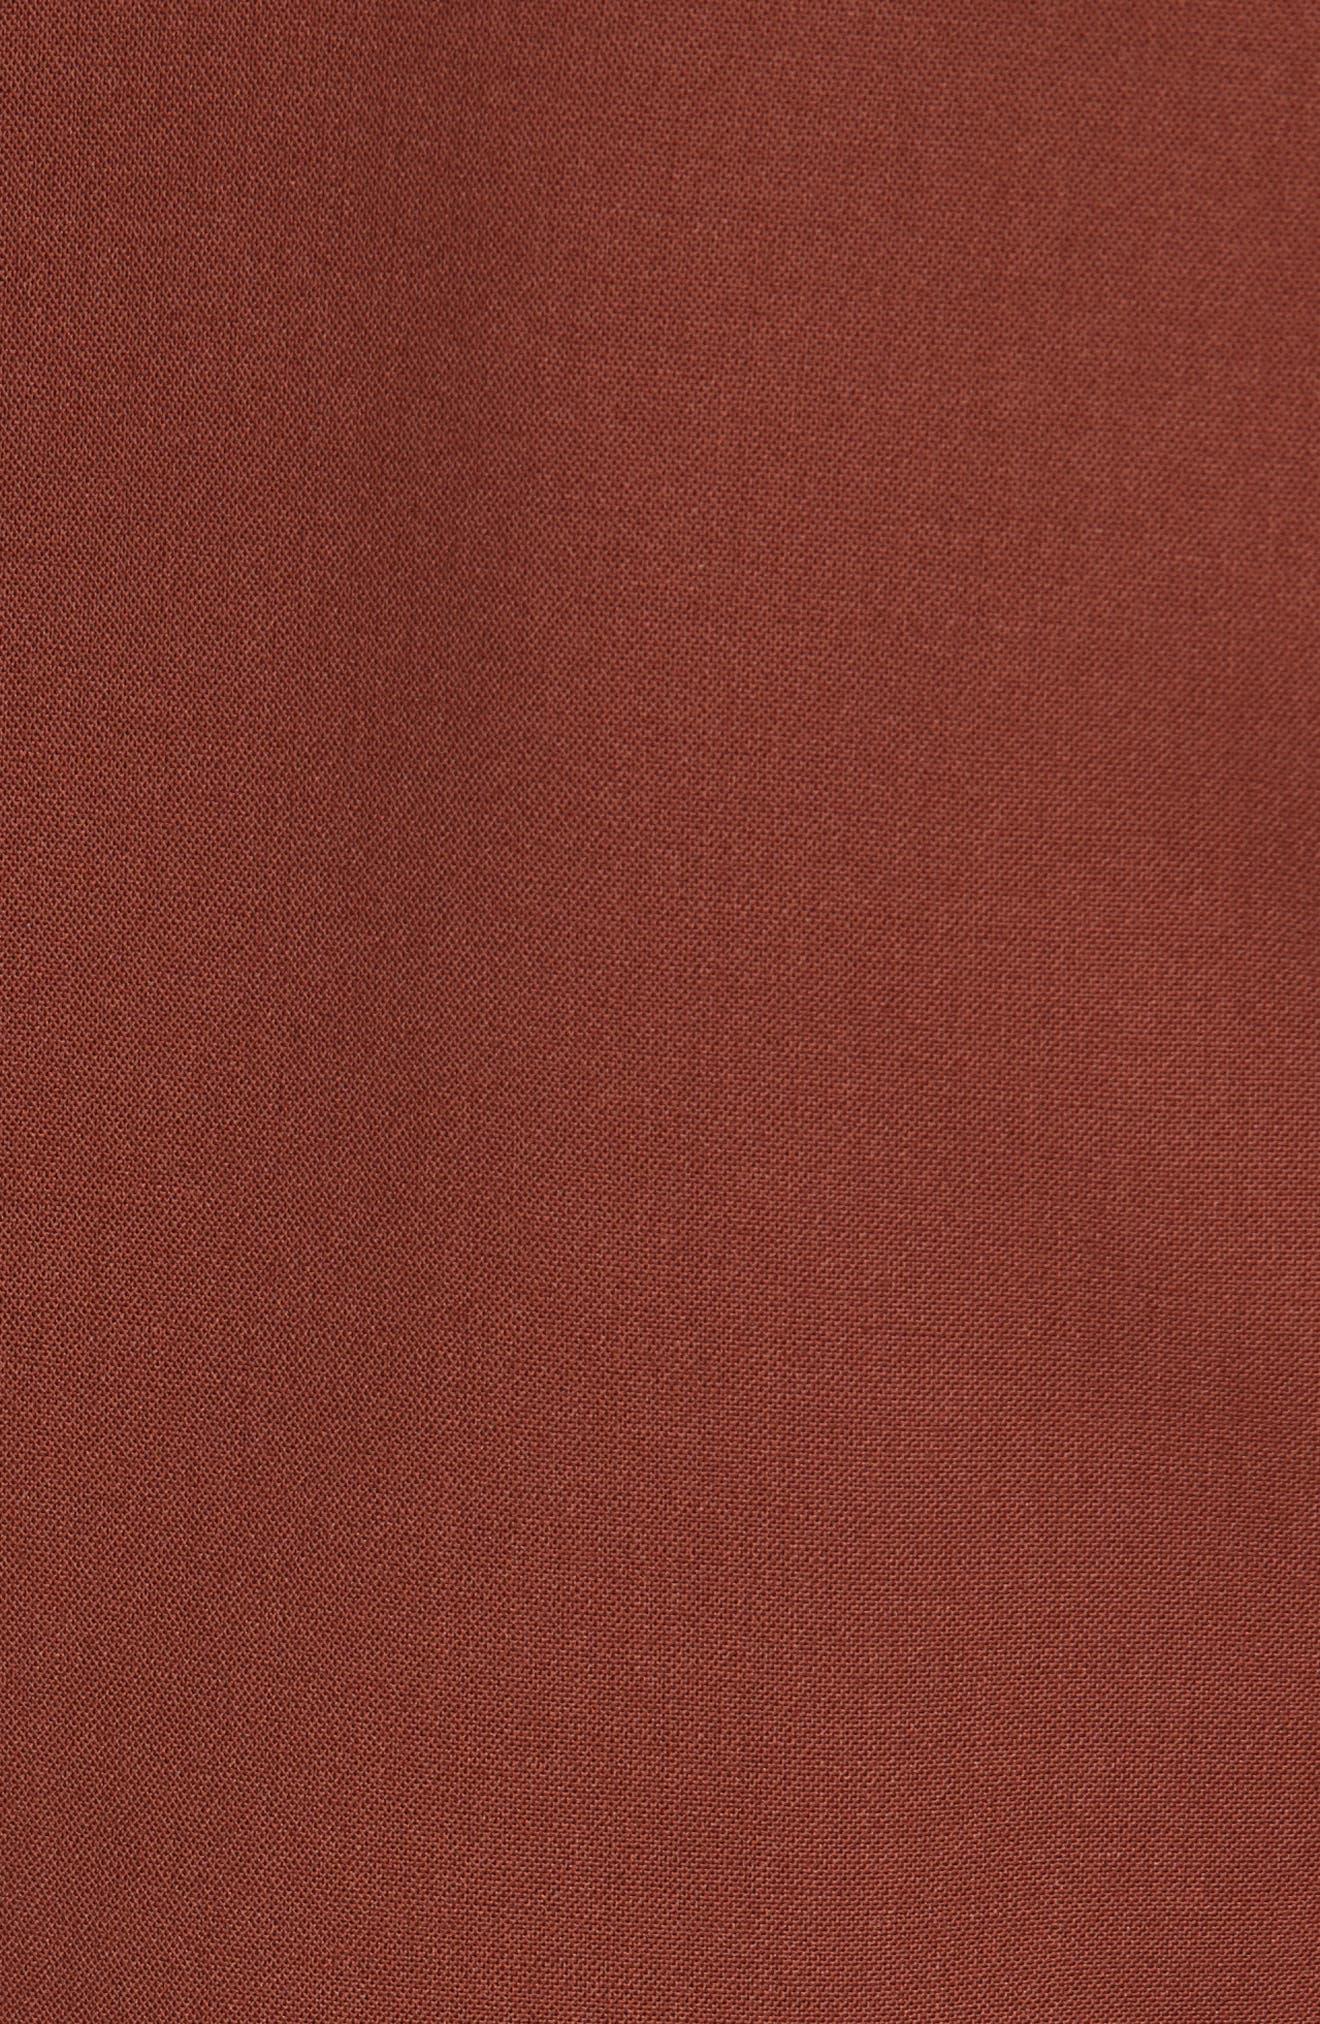 Etienette B Good Wool Suit Jacket,                             Alternate thumbnail 47, color,